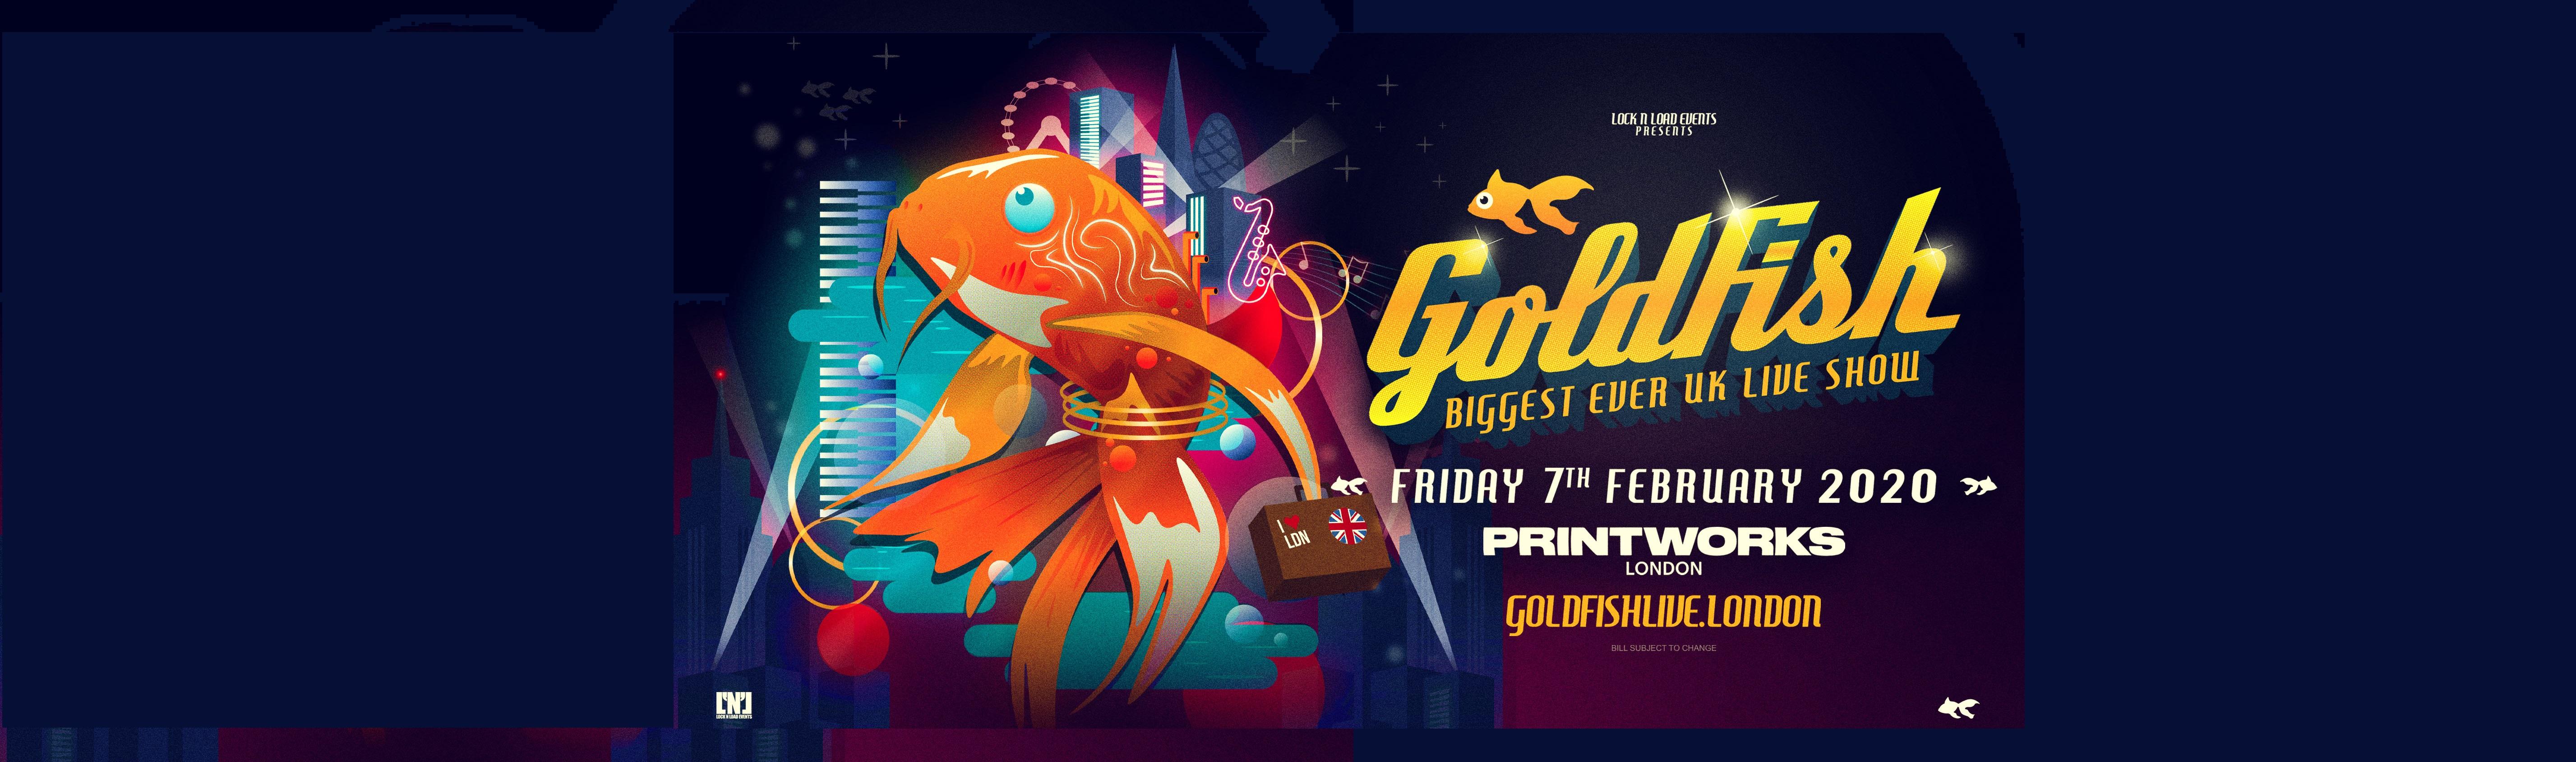 Lock 'n' Load Events Presents: Goldfish